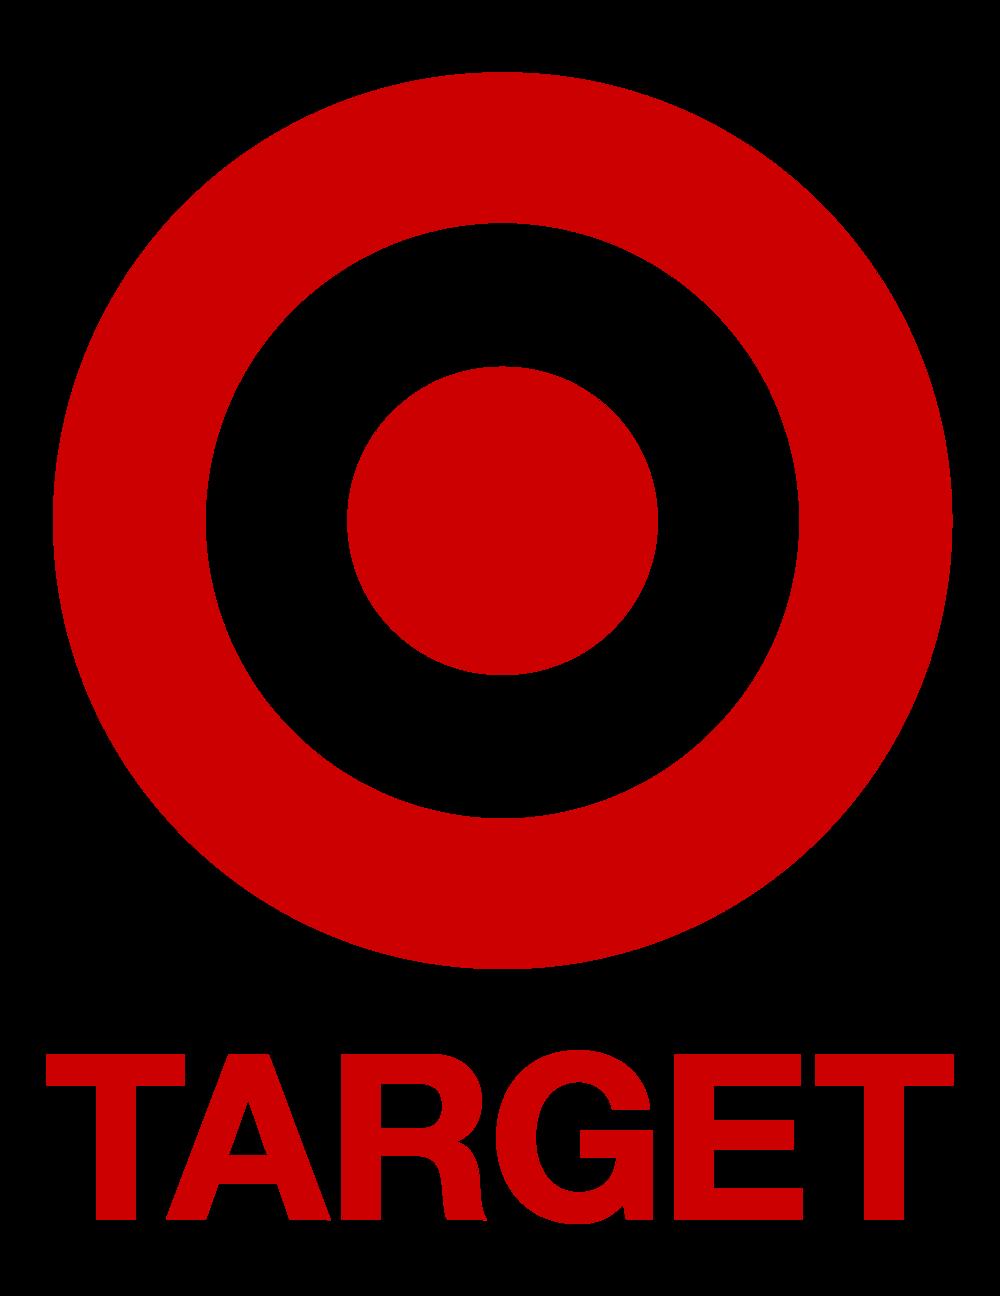 purepng.com-target-logologobrand-logoiconslogos-251519939485oxces.png